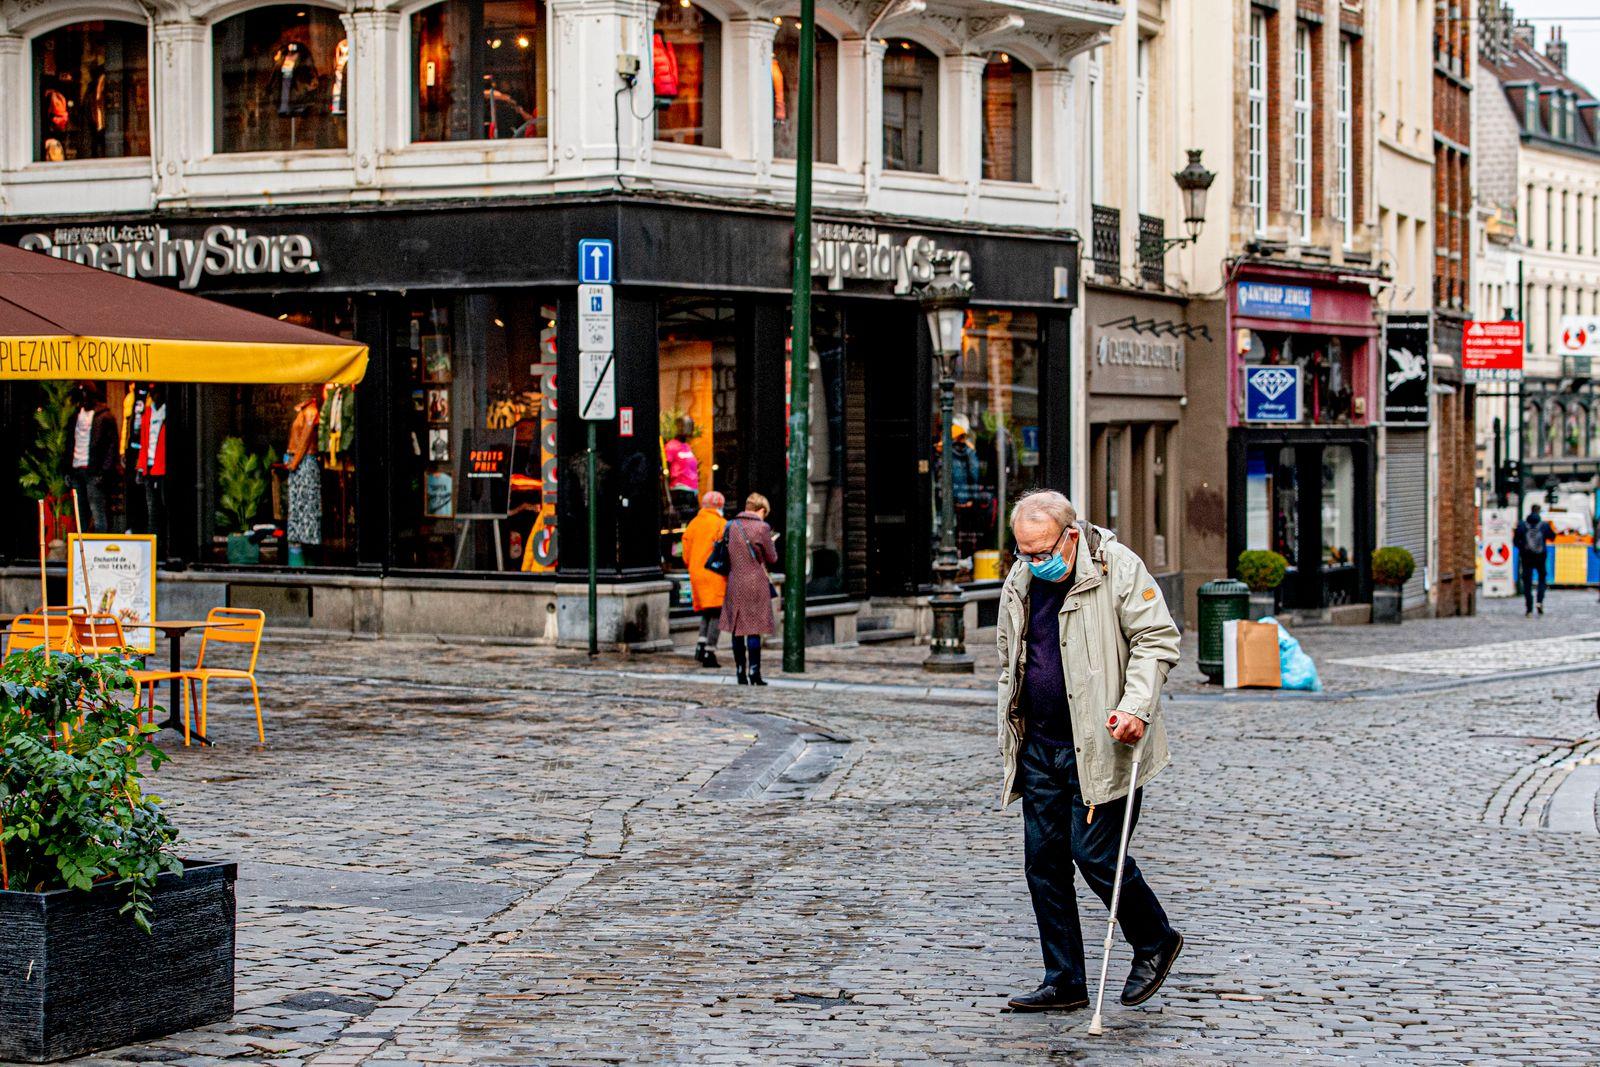 An elderly man wearing a facemask walks on the street. The